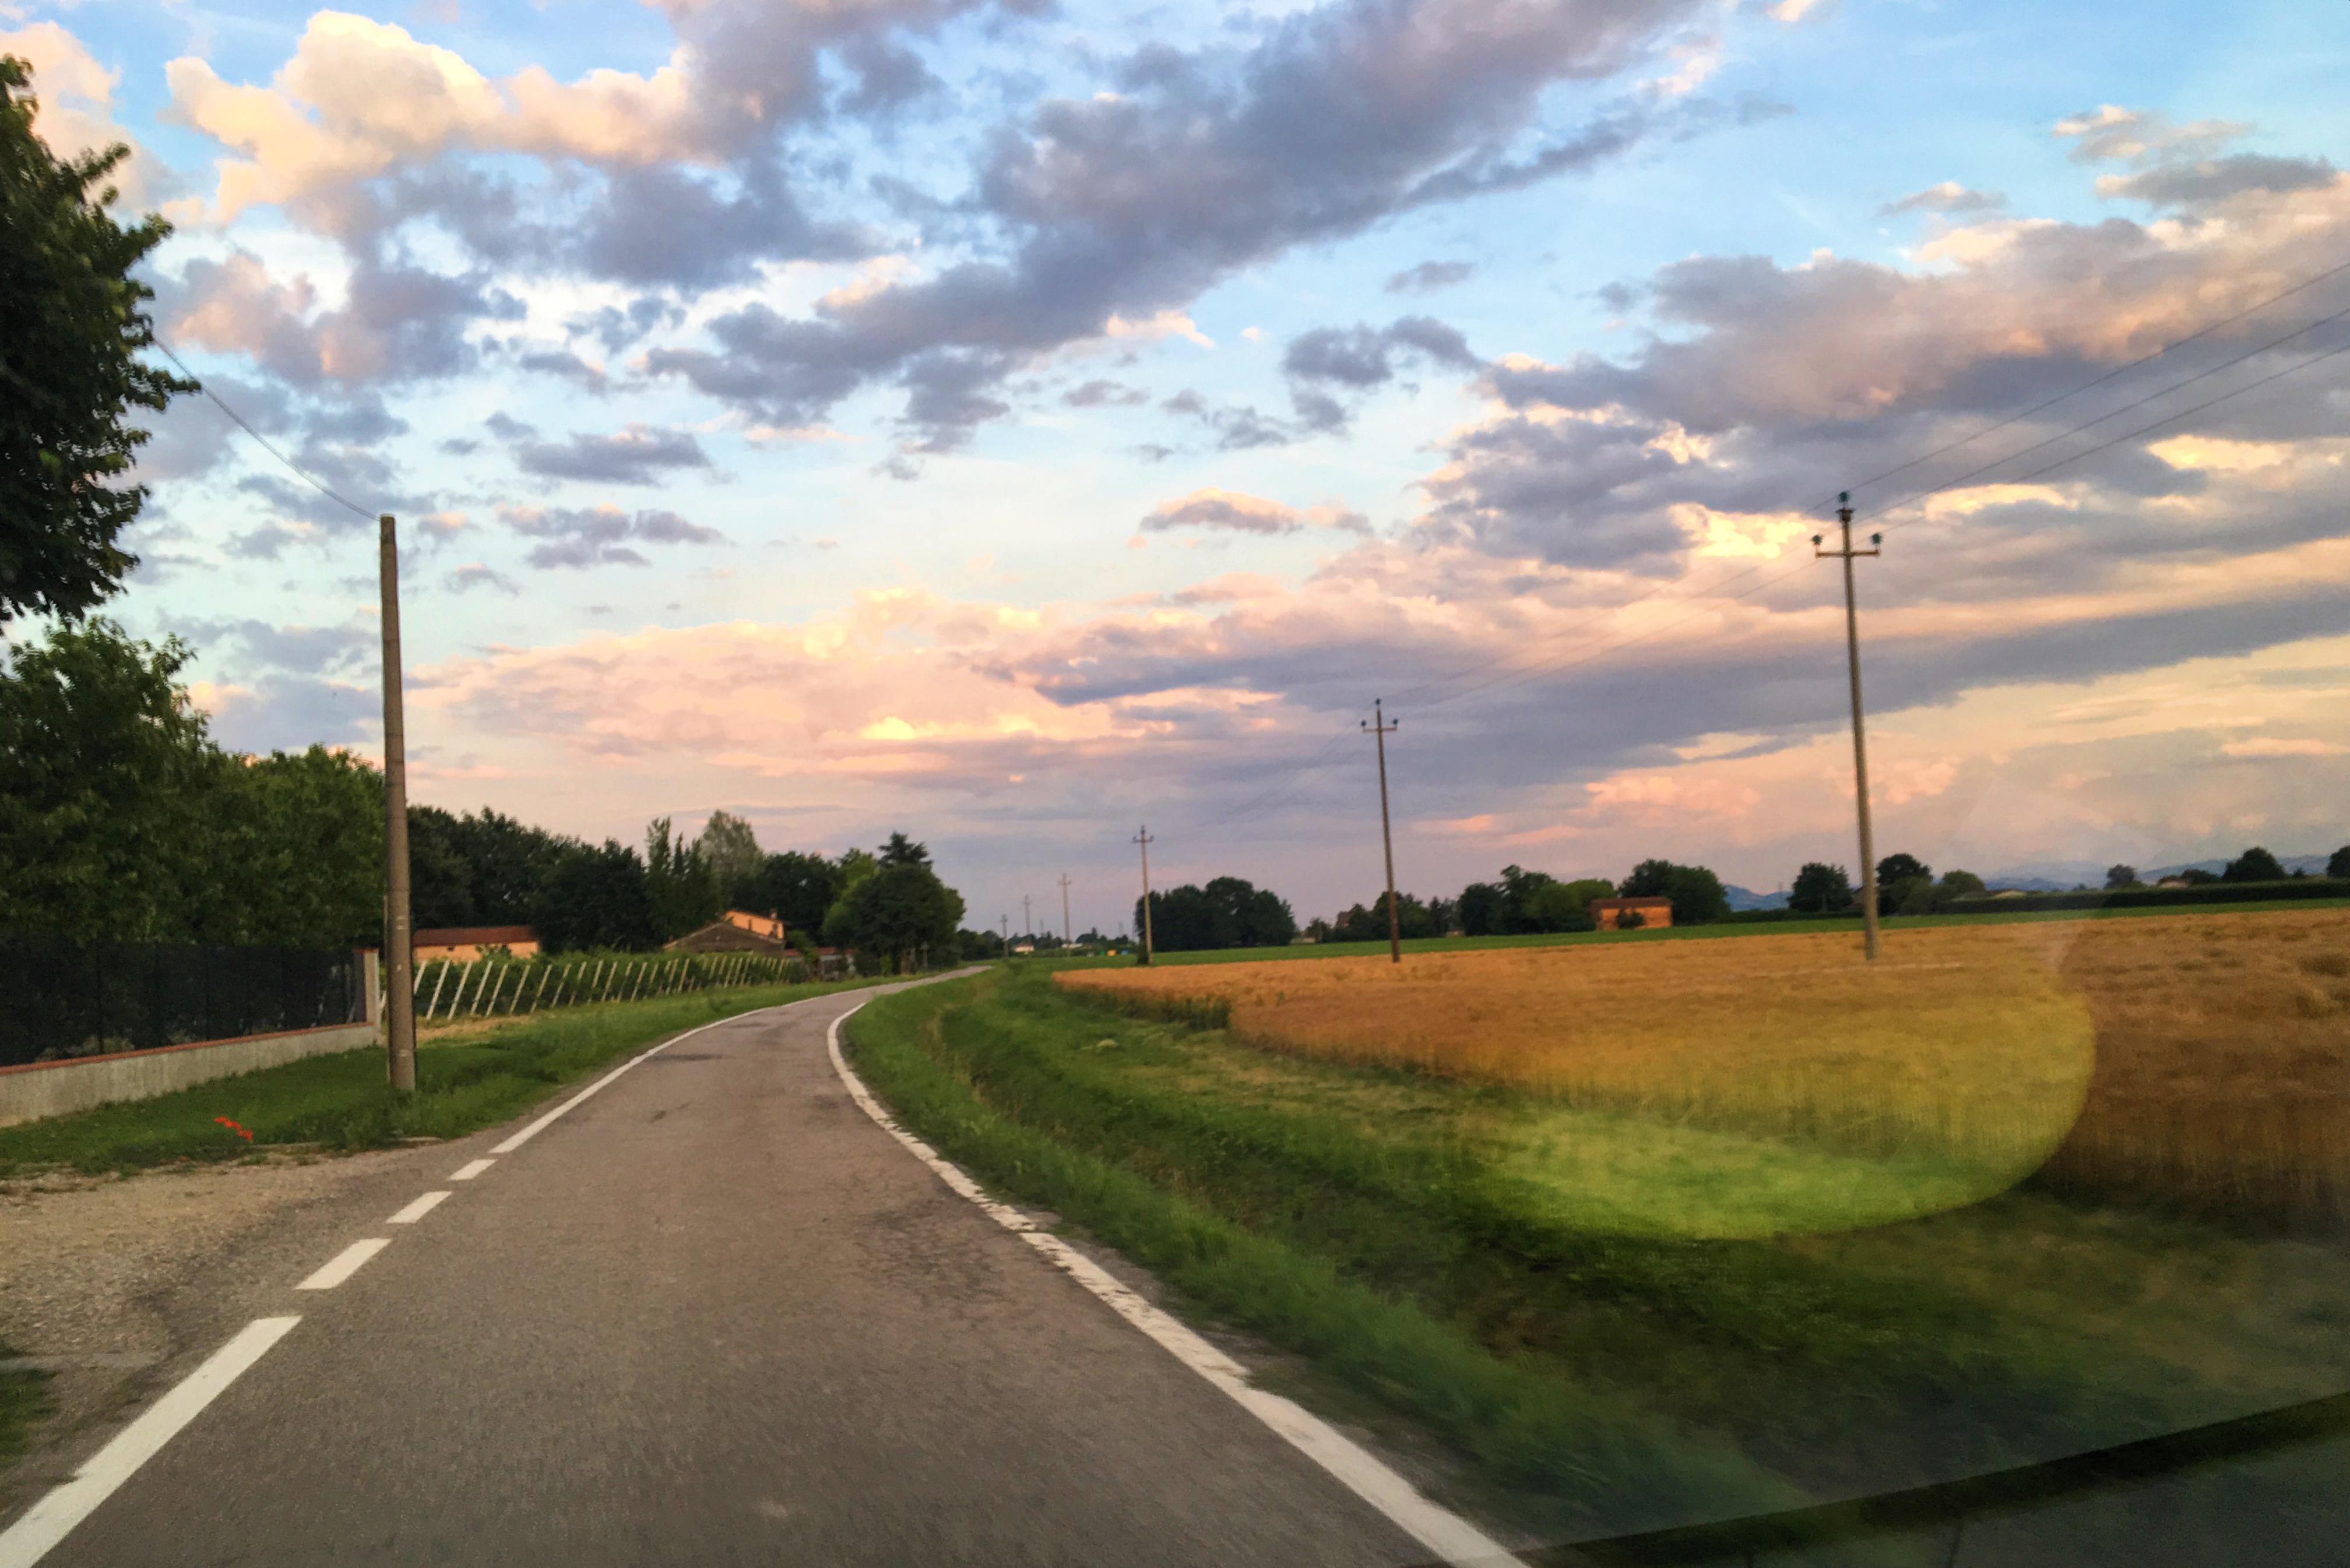 I tramonti romagnoli